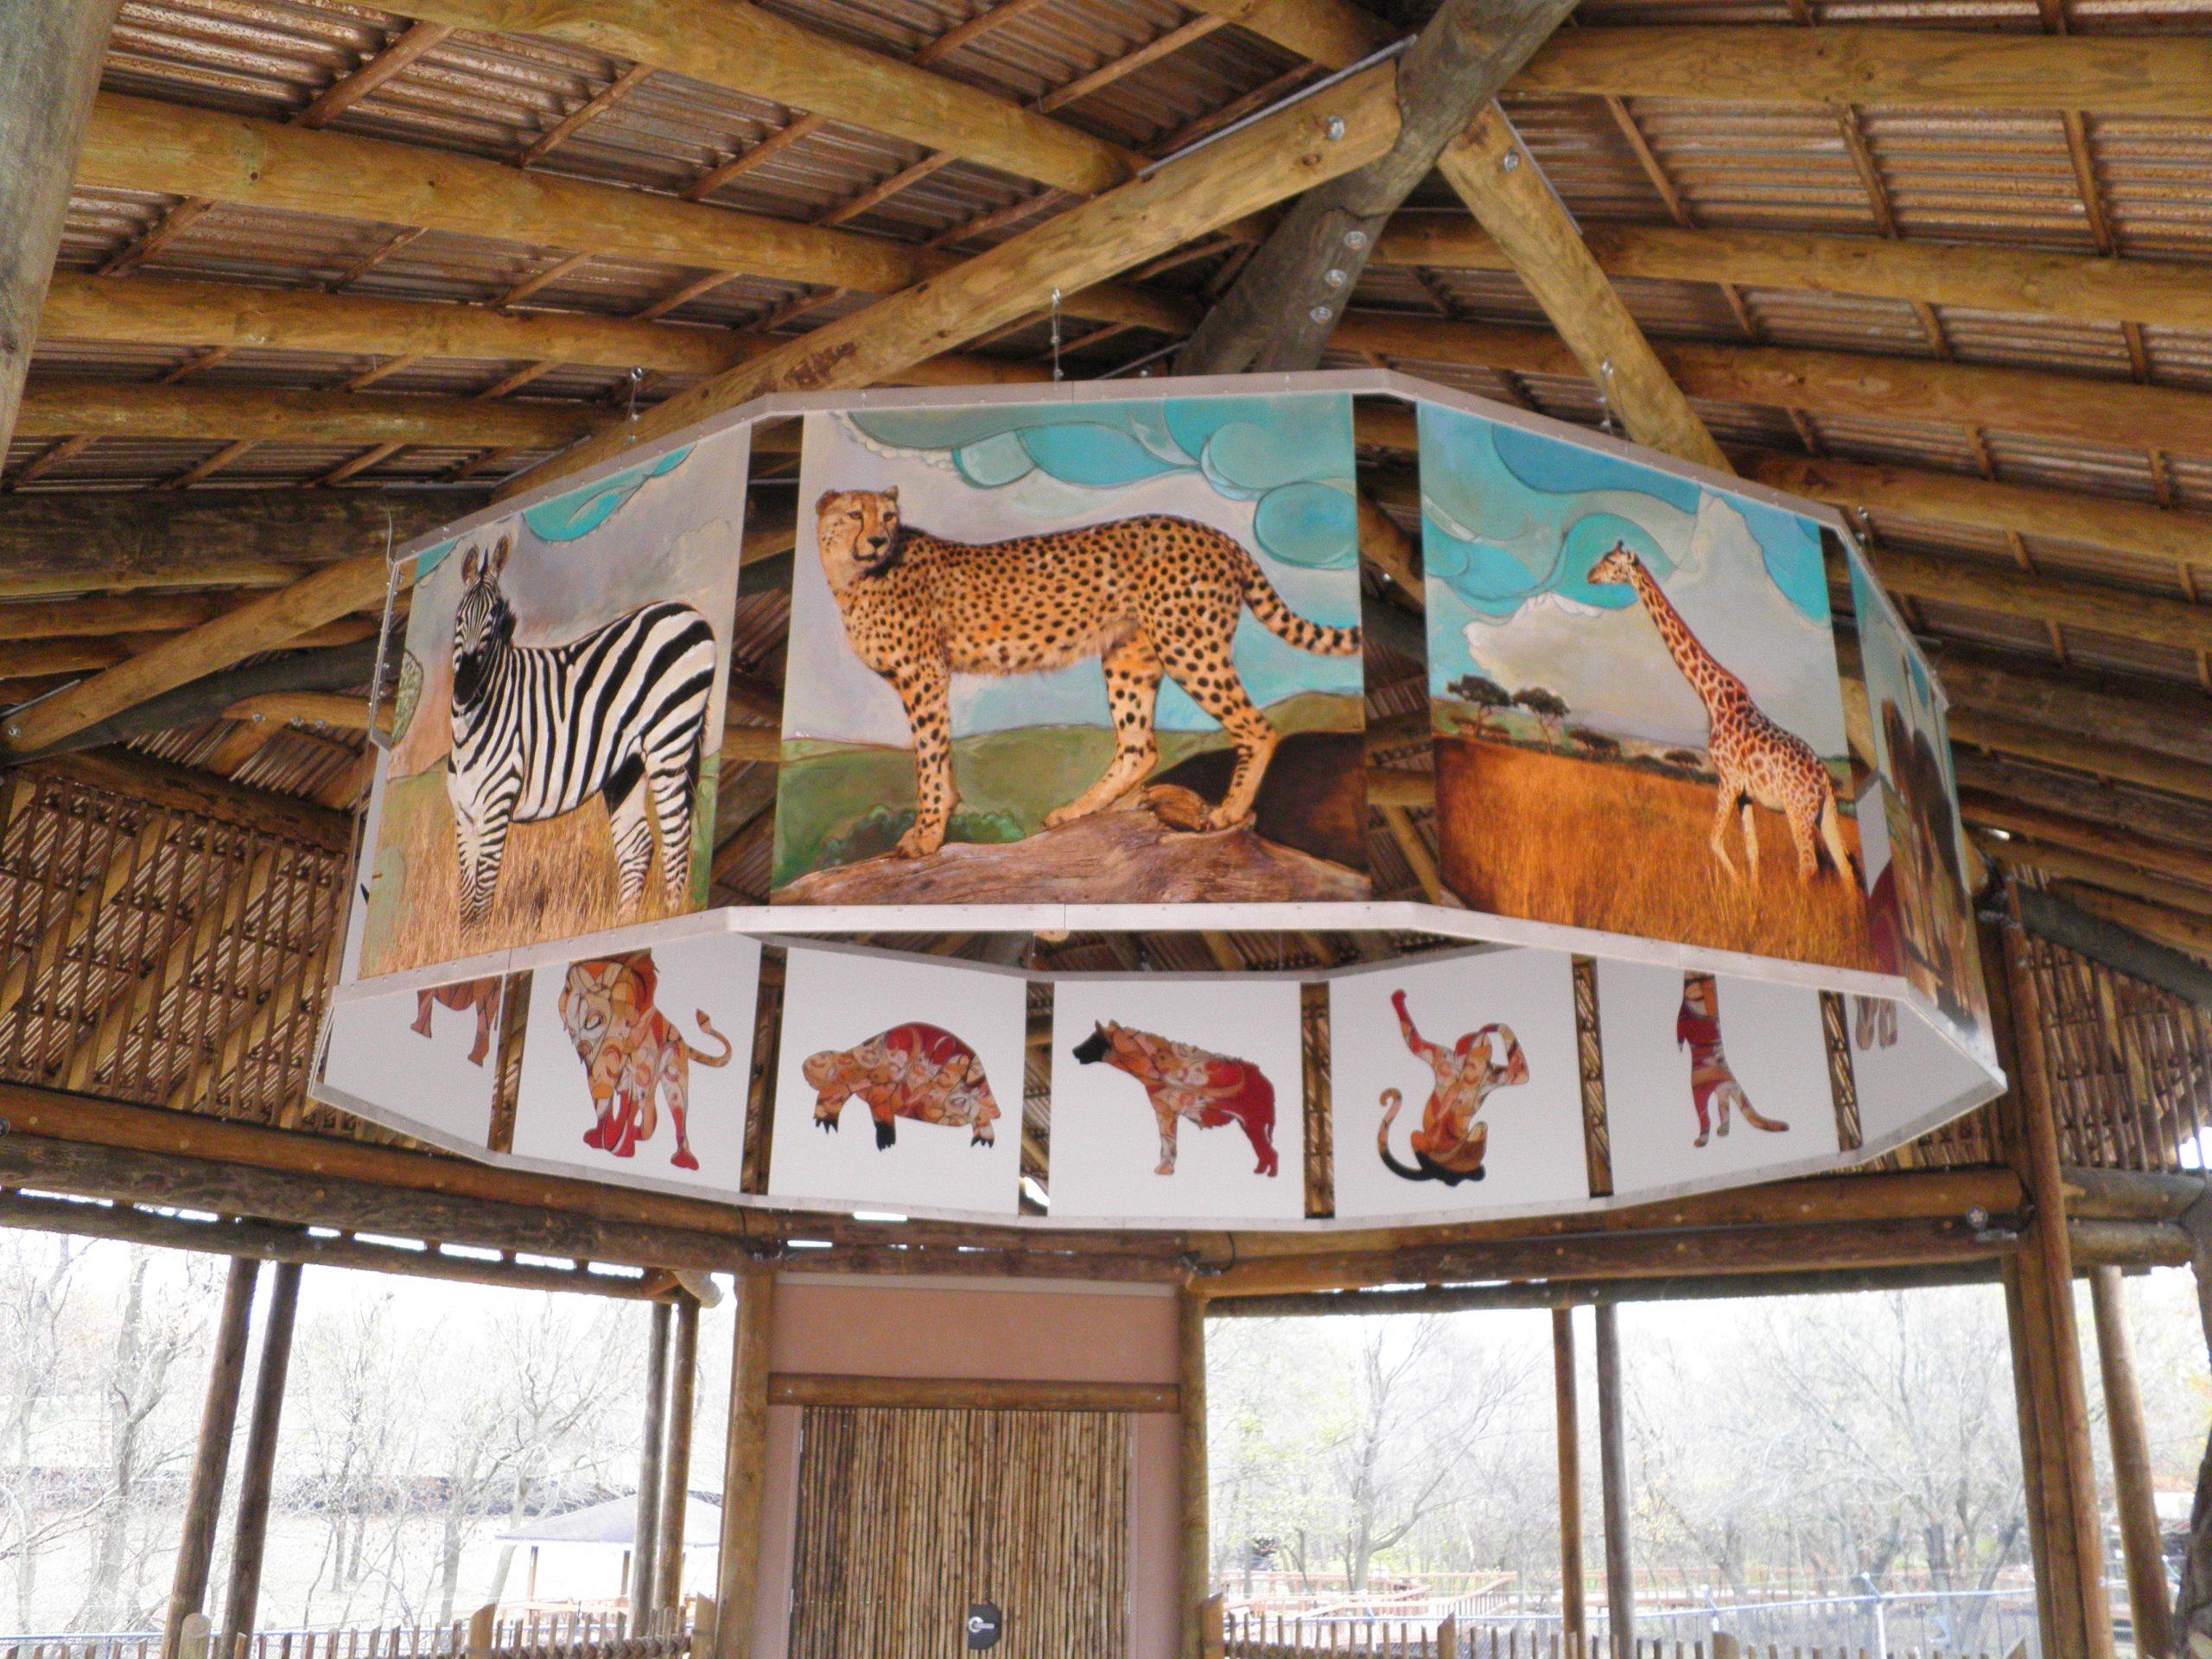 JAAMA KWA Africa Exhibit interior animal panels